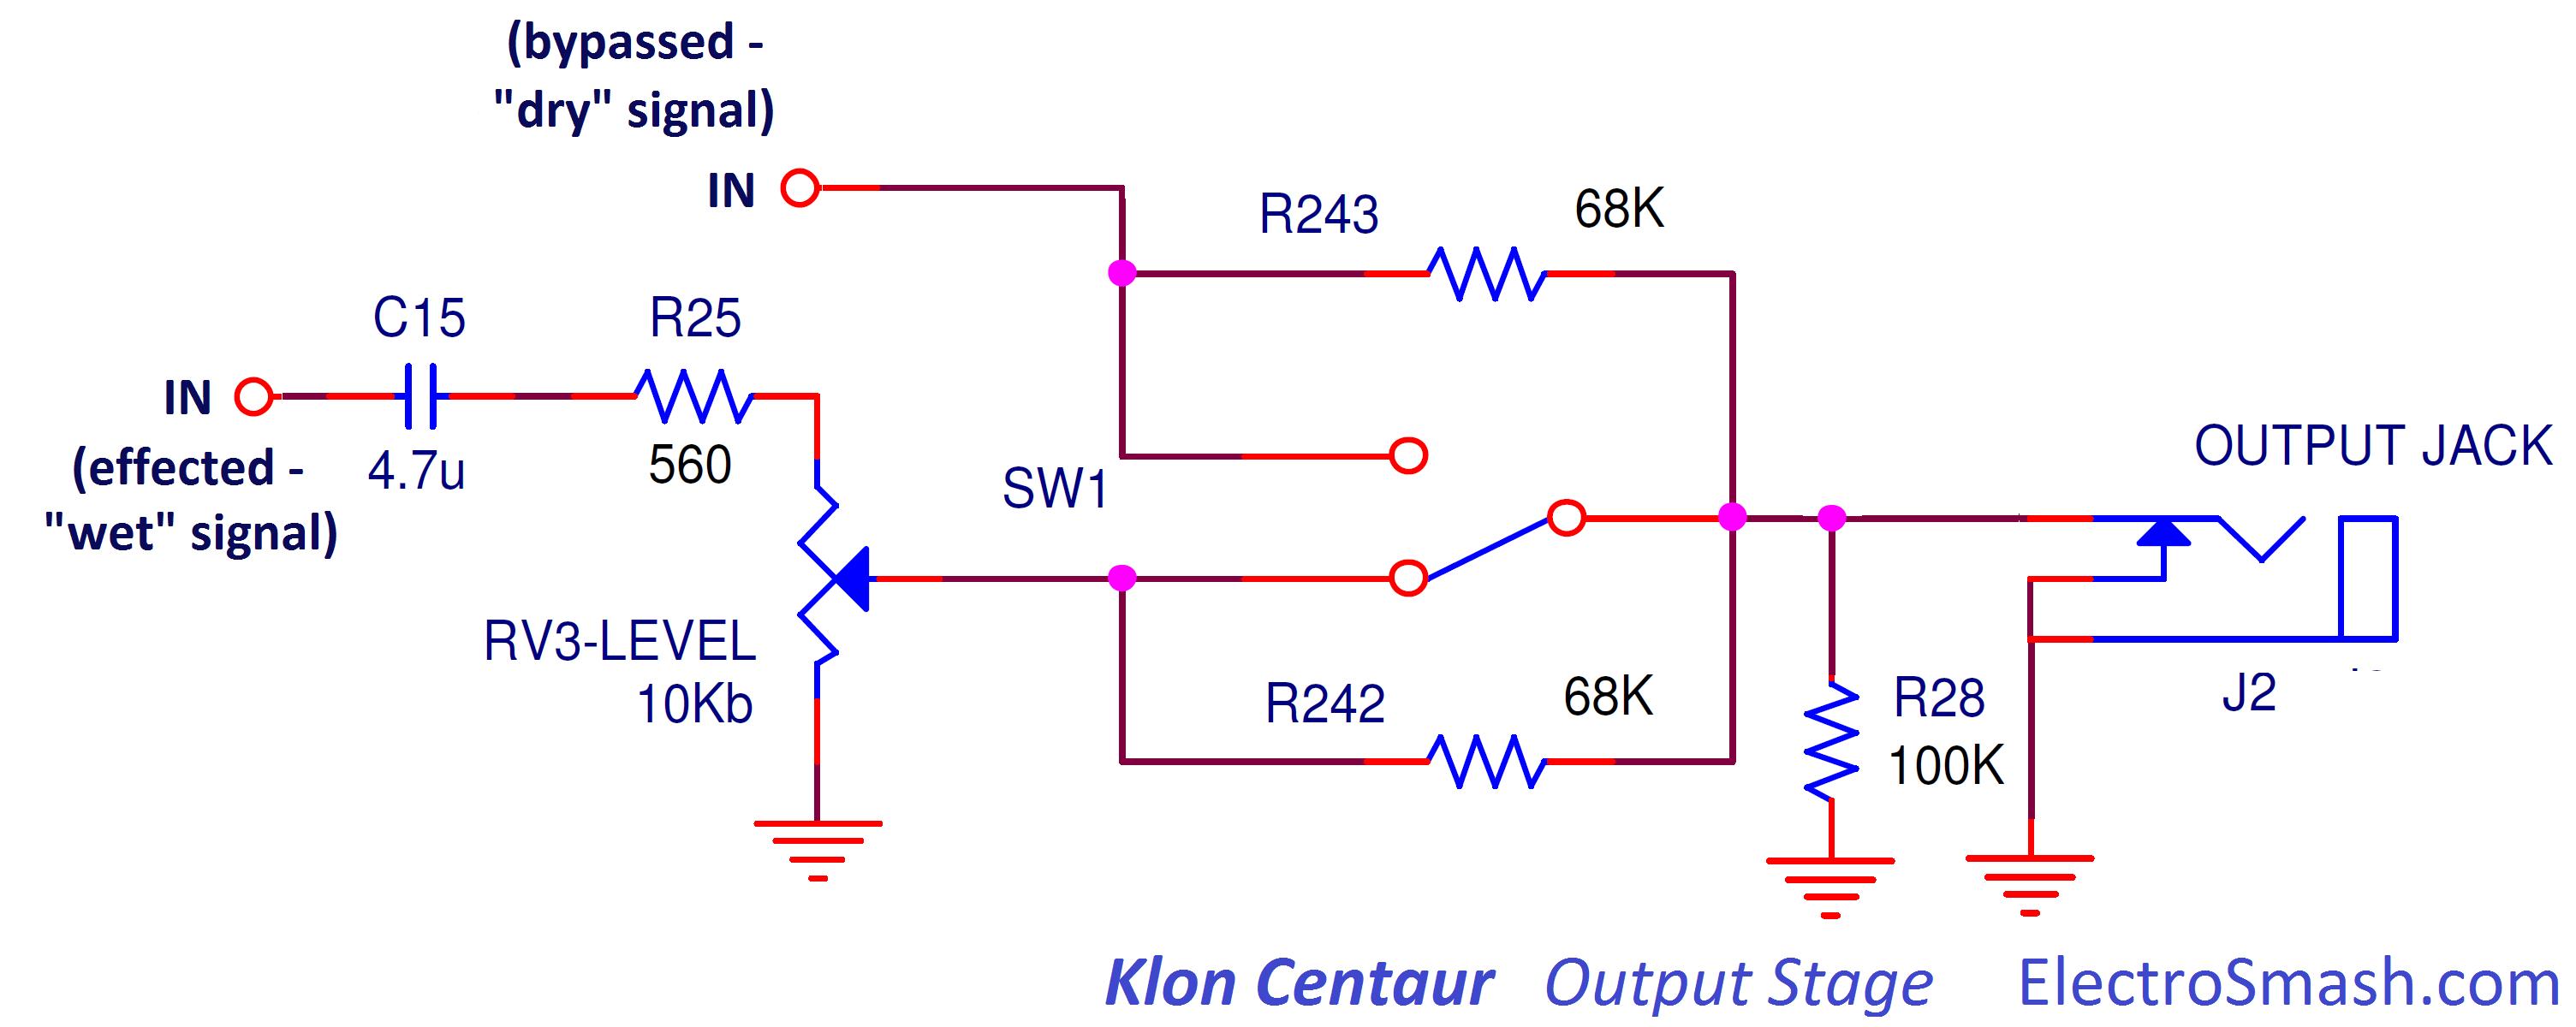 Electrosmash Klon Cenatur Analysis Figure 1 Wah Pedal Circuit Schematic Diagram Centaur Output Stage